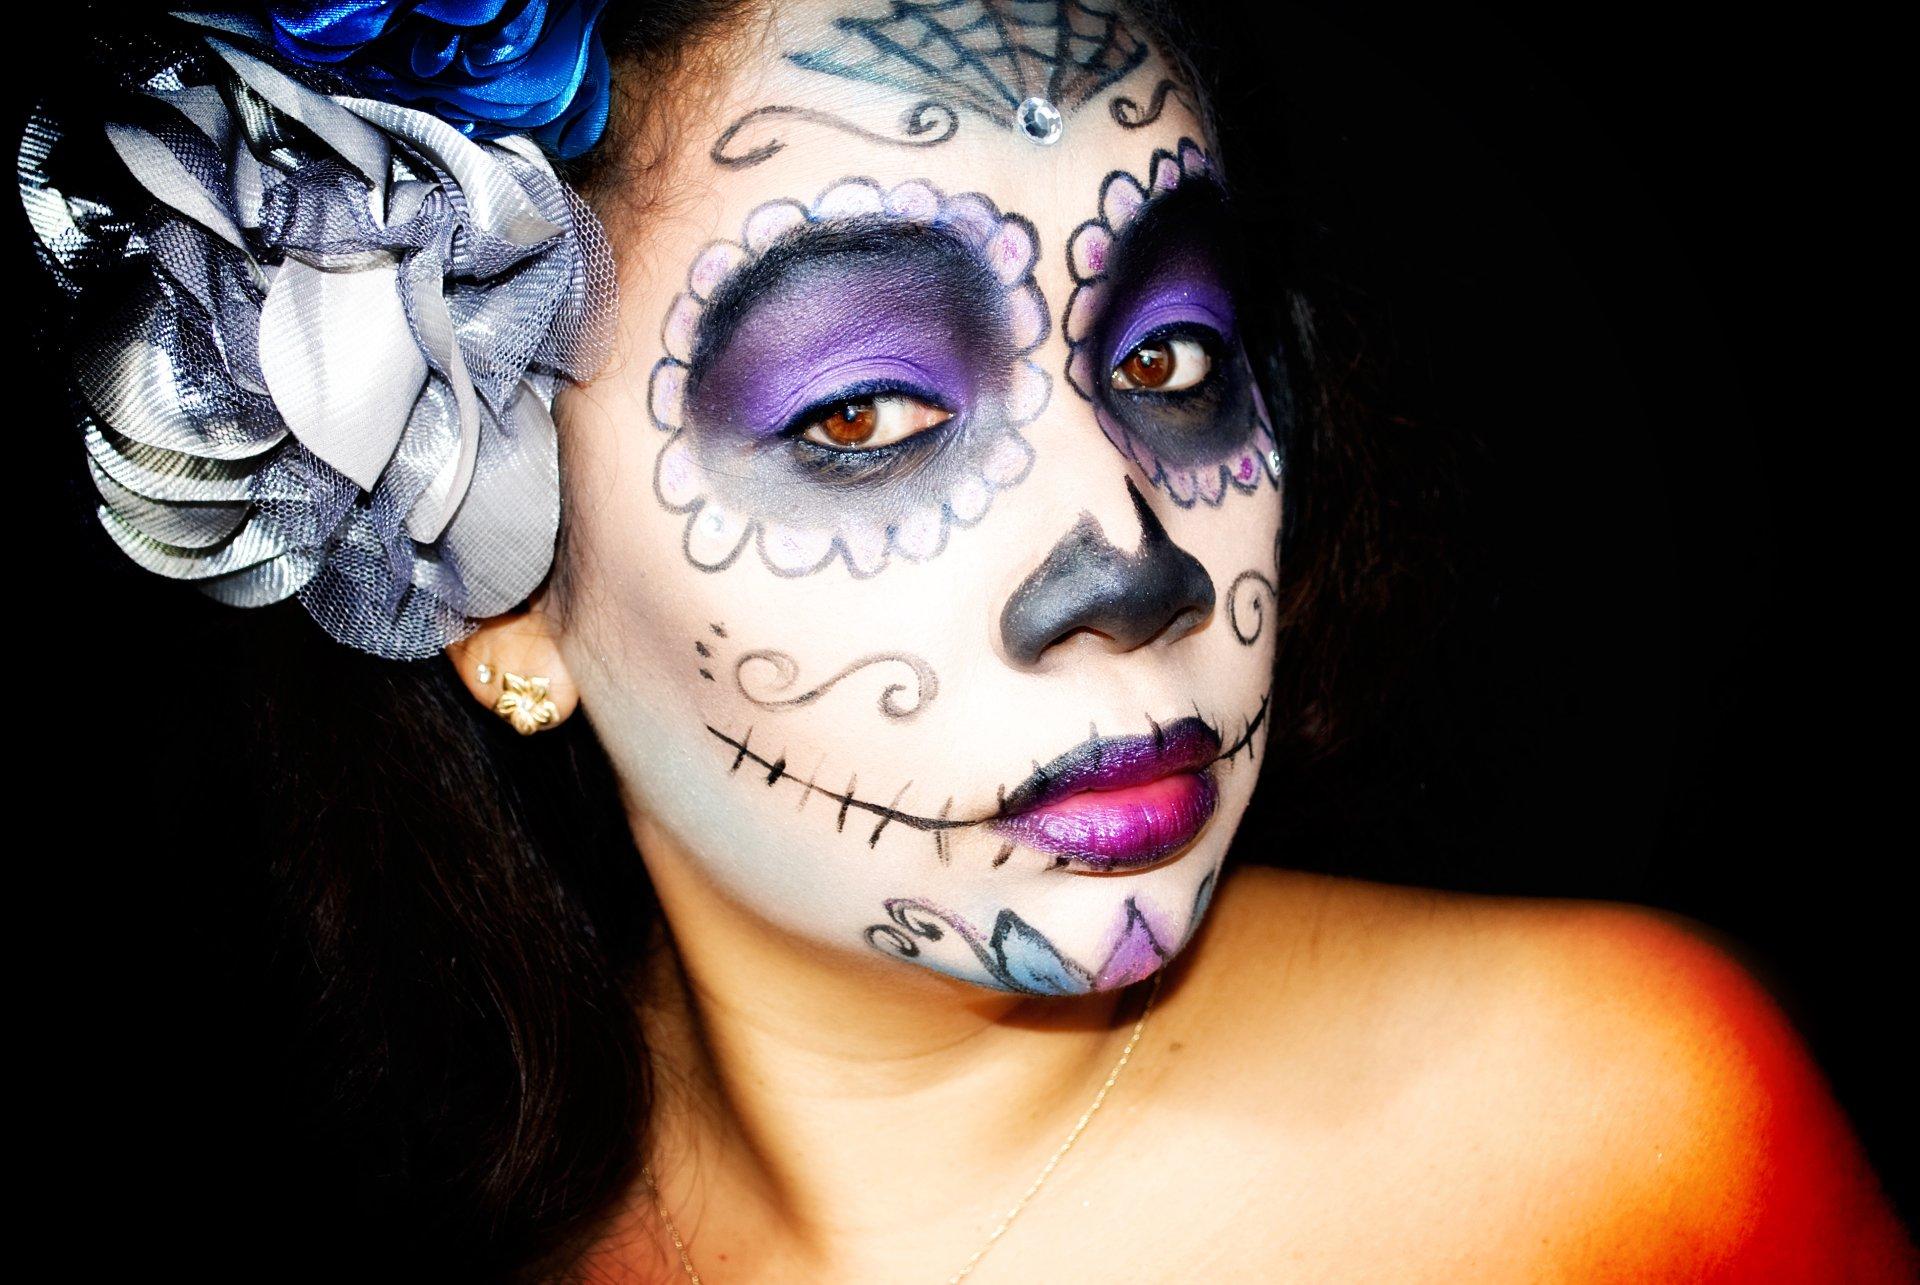 sugar skull makeup wallpaper - photo #14